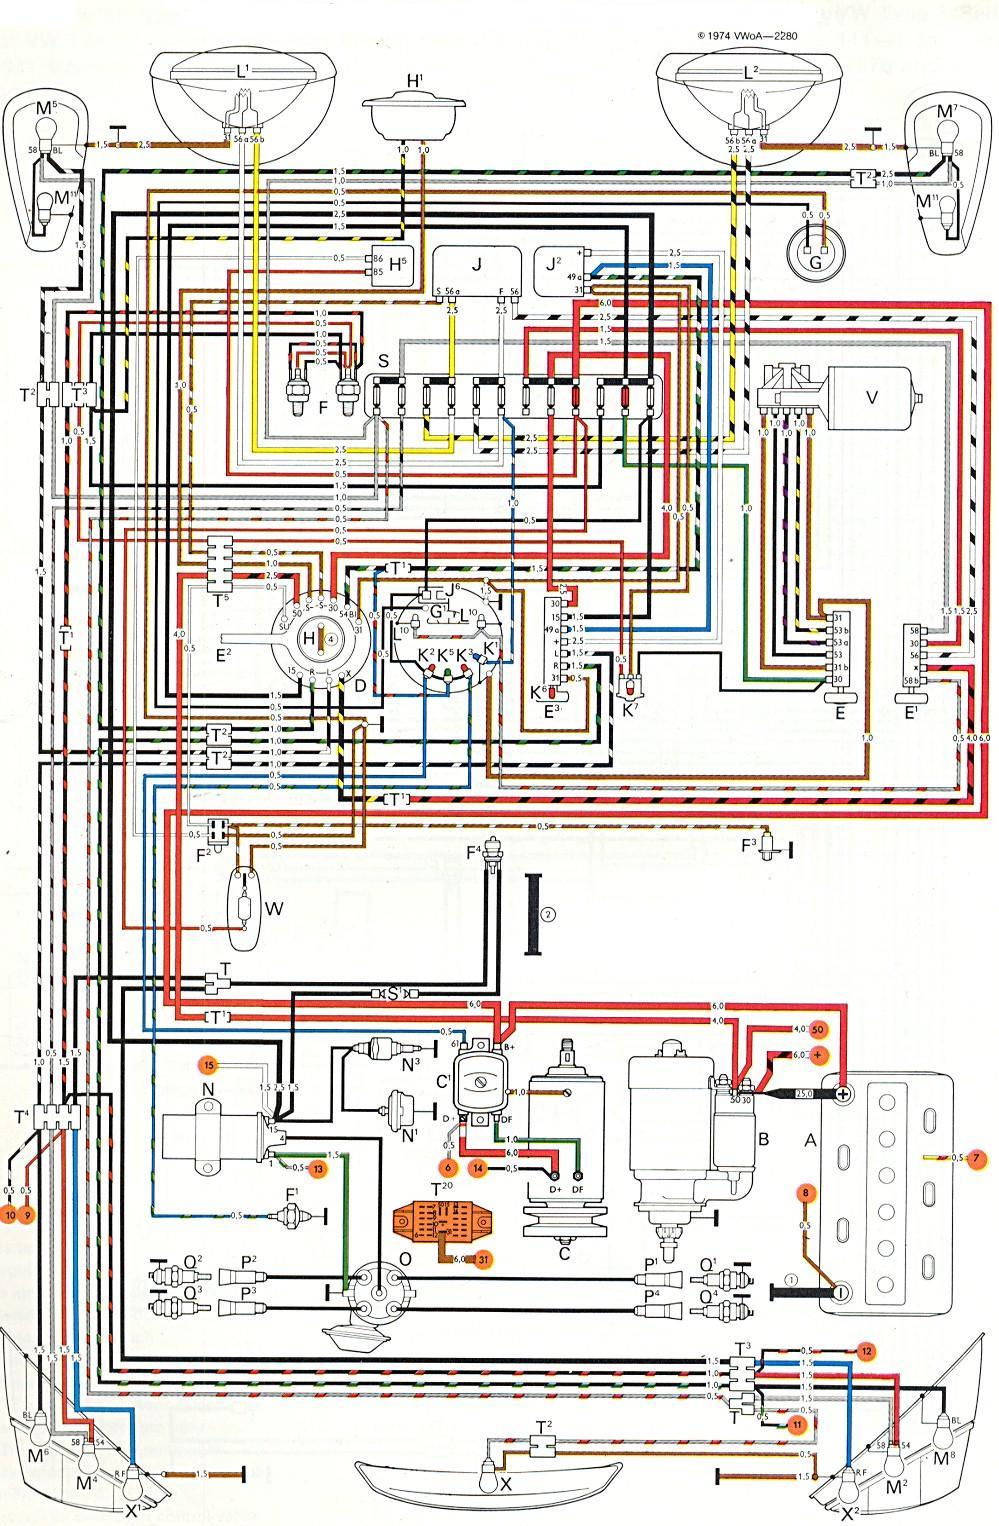 vw buggy wiring harness diagram - wiring diagrams bear-sense -  bear-sense.massimocariello.it  massimocariello.it